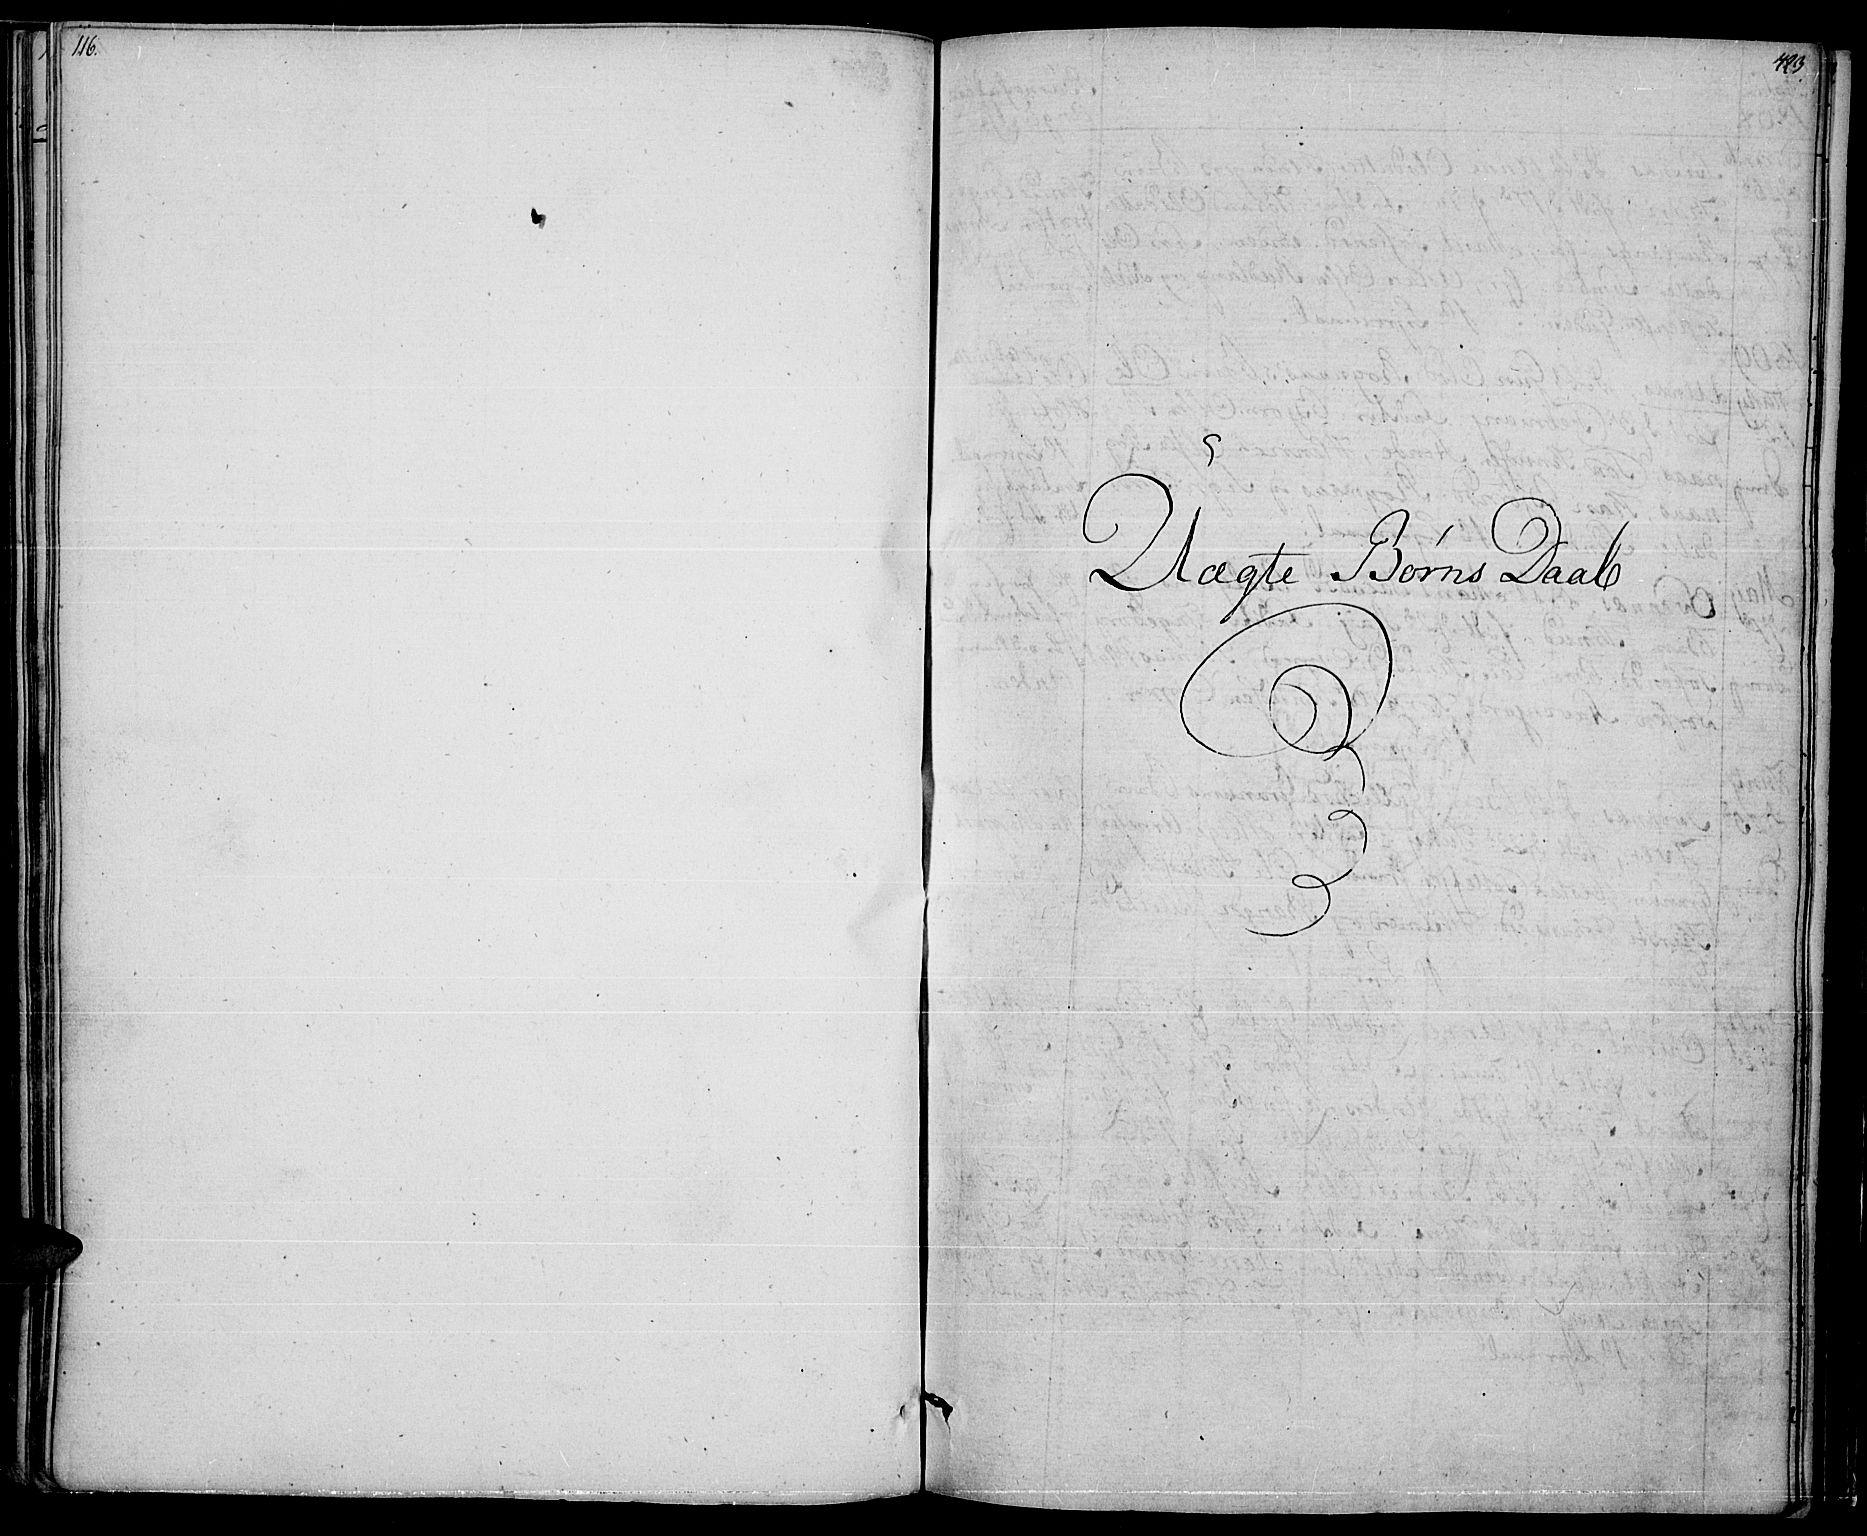 SAH, Nord-Aurdal prestekontor, Ministerialbok nr. 1, 1808-1815, s. 422-423